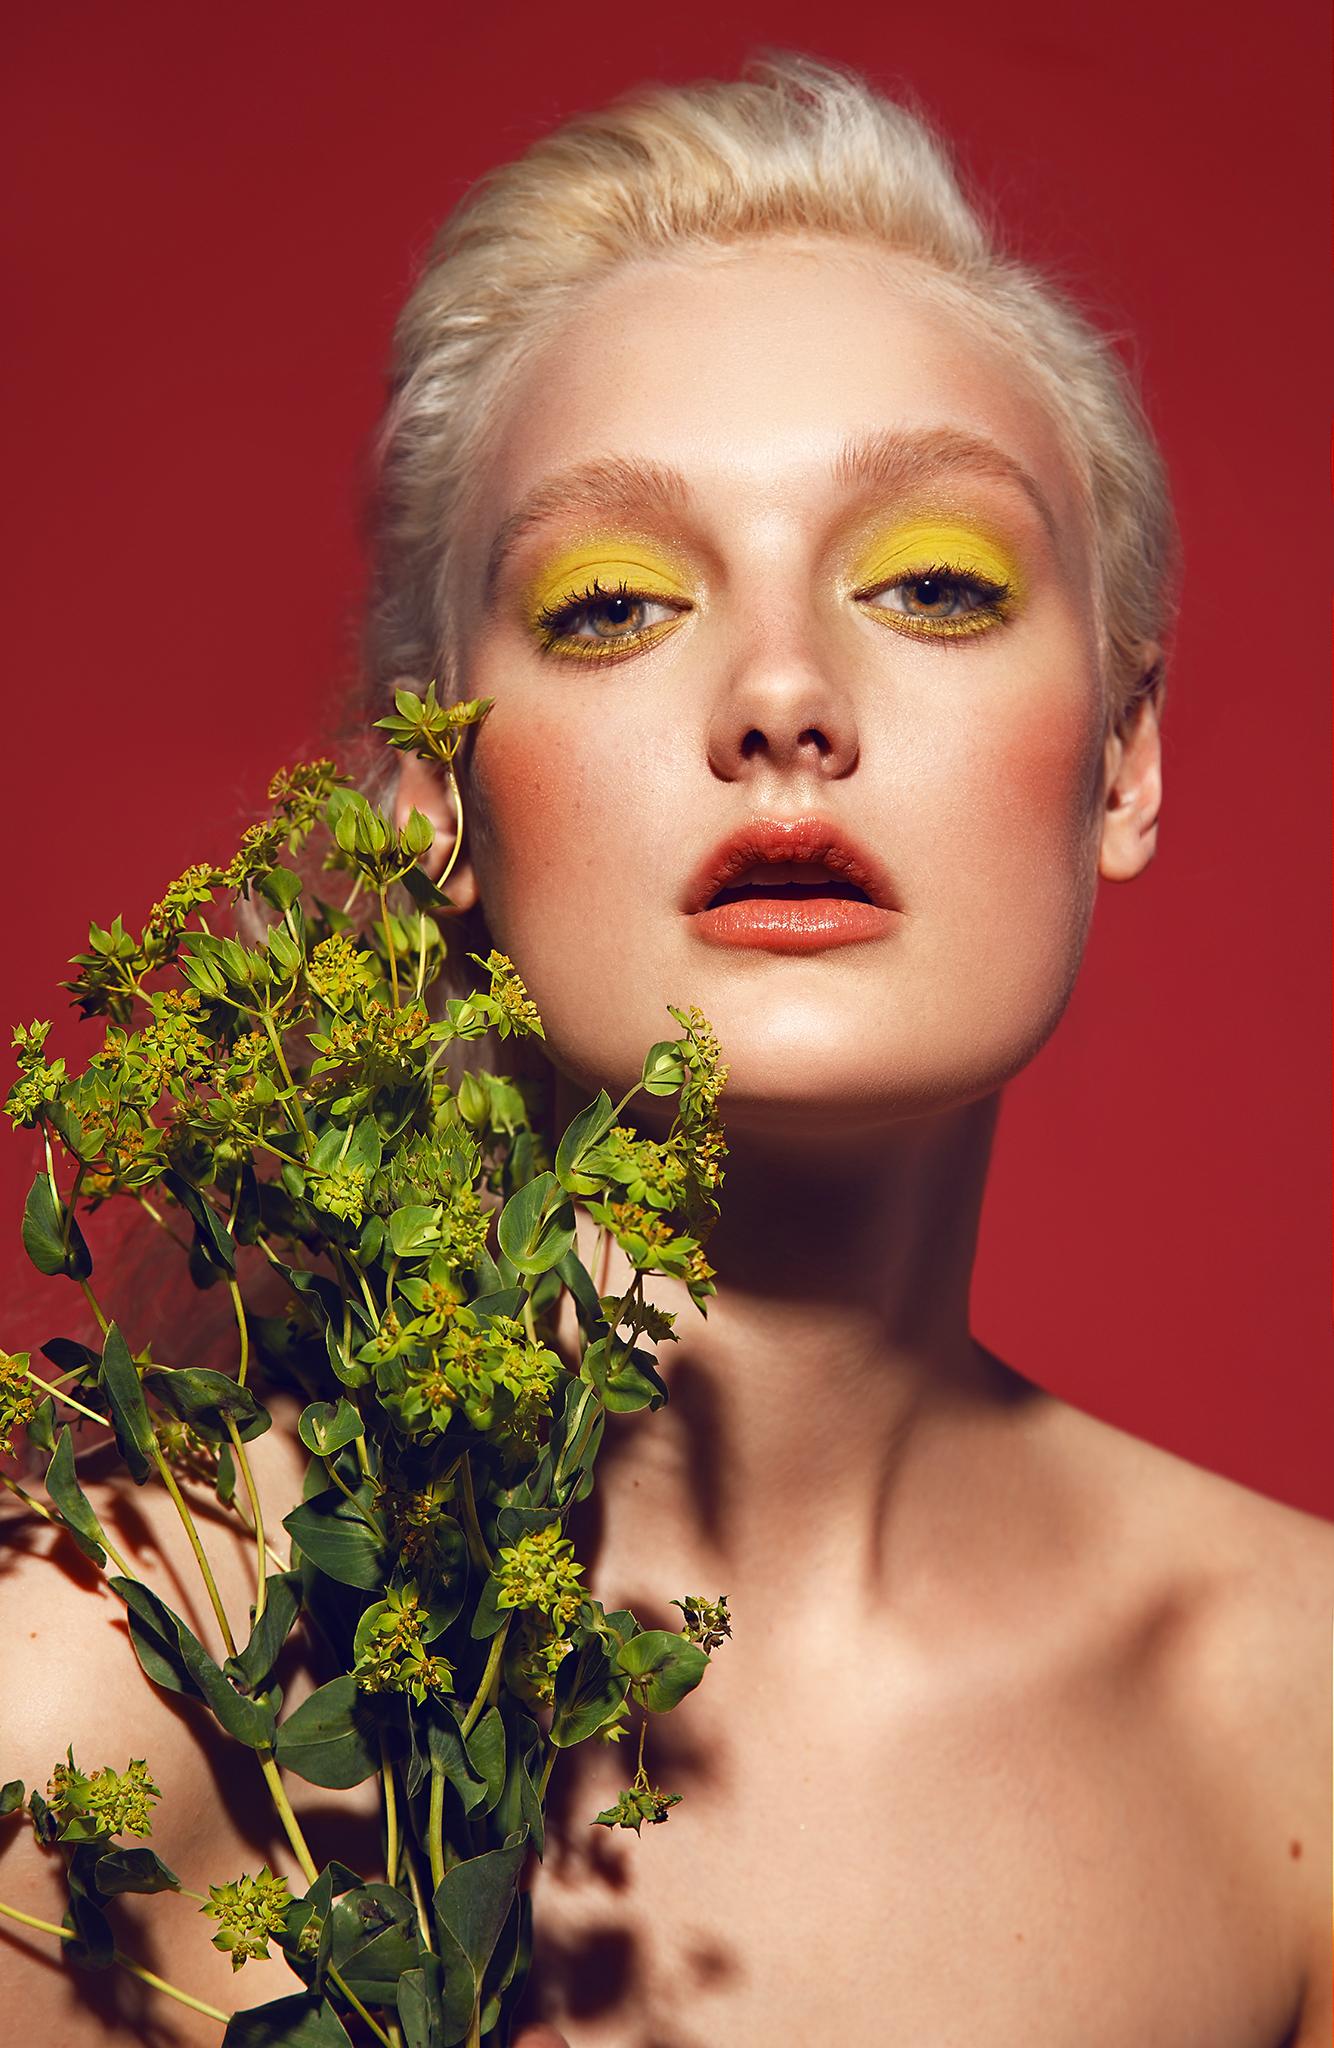 Beauty-Photography-by-beauty-Photographer-Dana-Cole-yellow-eyeshadow-makeup-fashion-model-heartbreak-models-flowers-profoto-blonde-model-red-lips-beauty-photo-colorful-makeup.jpg